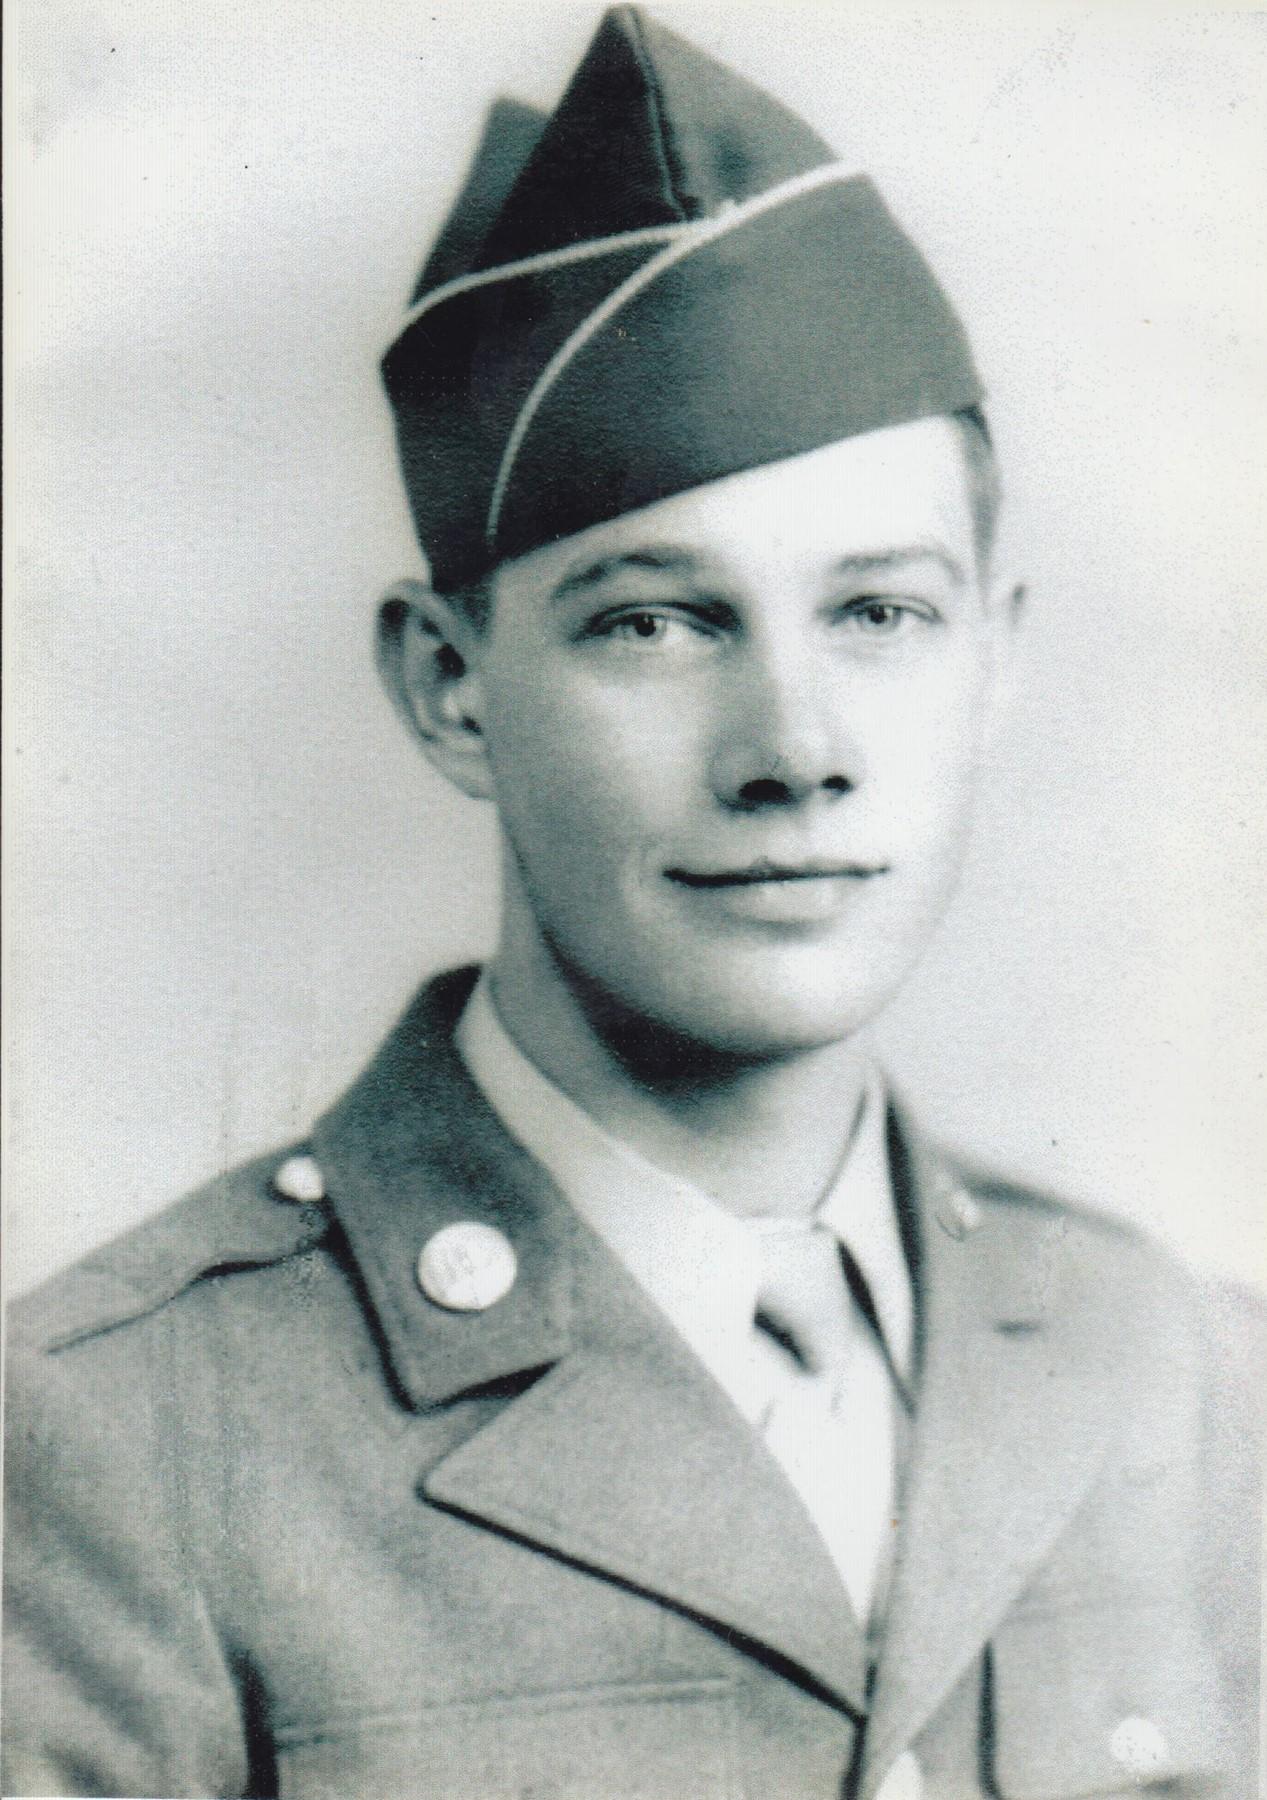 James Keith Parrish Obituary - Cullman, AL